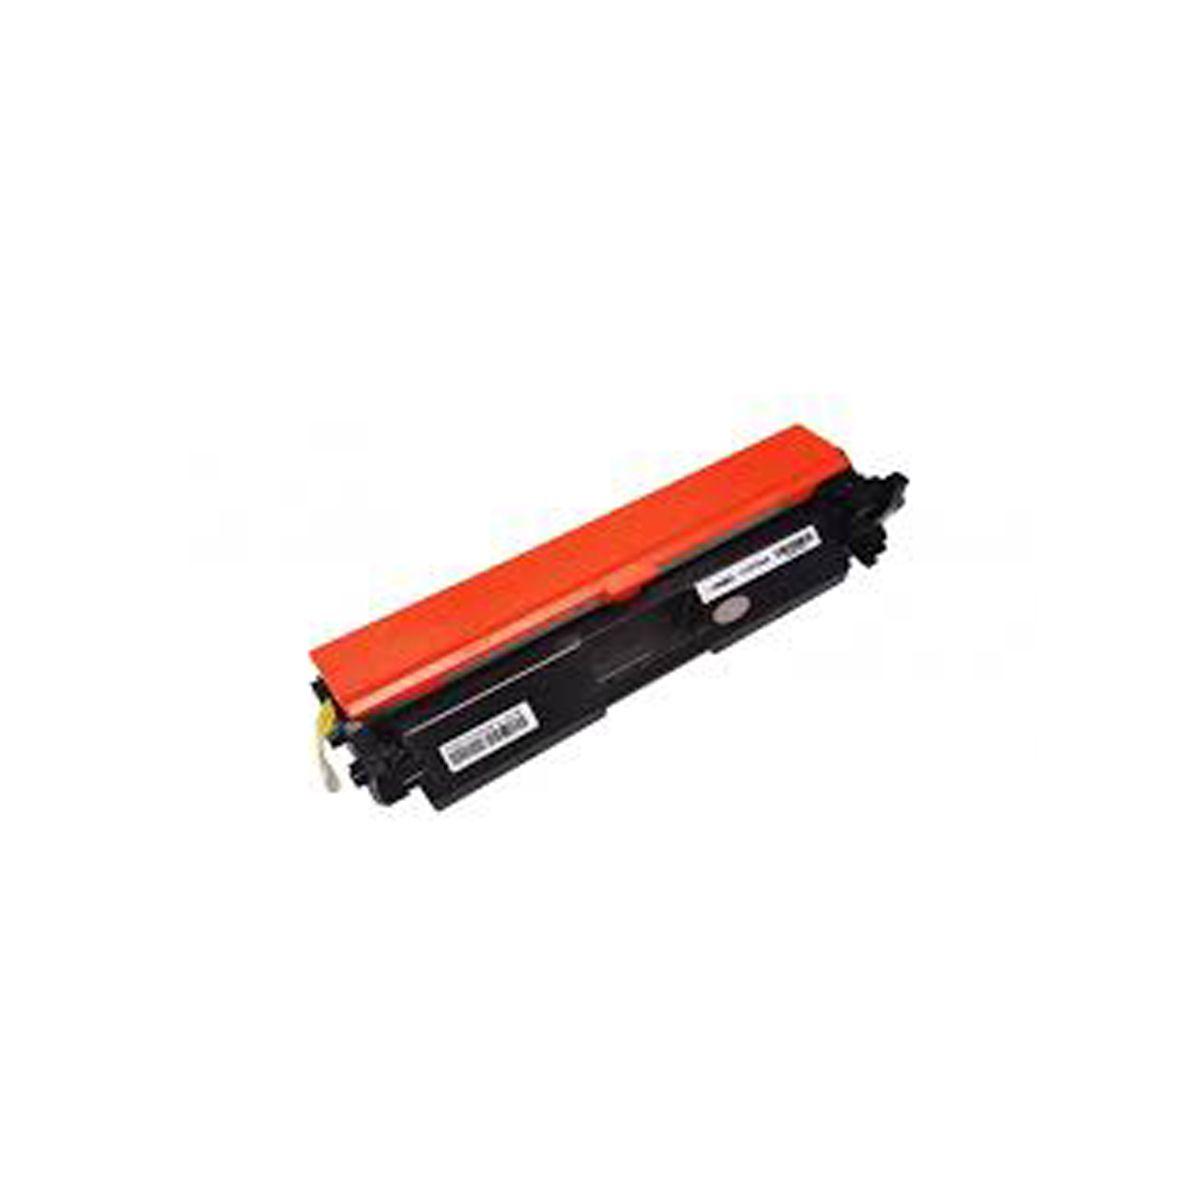 Toner CF230A CE230 30A - M203 M227 M203DW M203DN M227FDW M227SDN - 1.6k